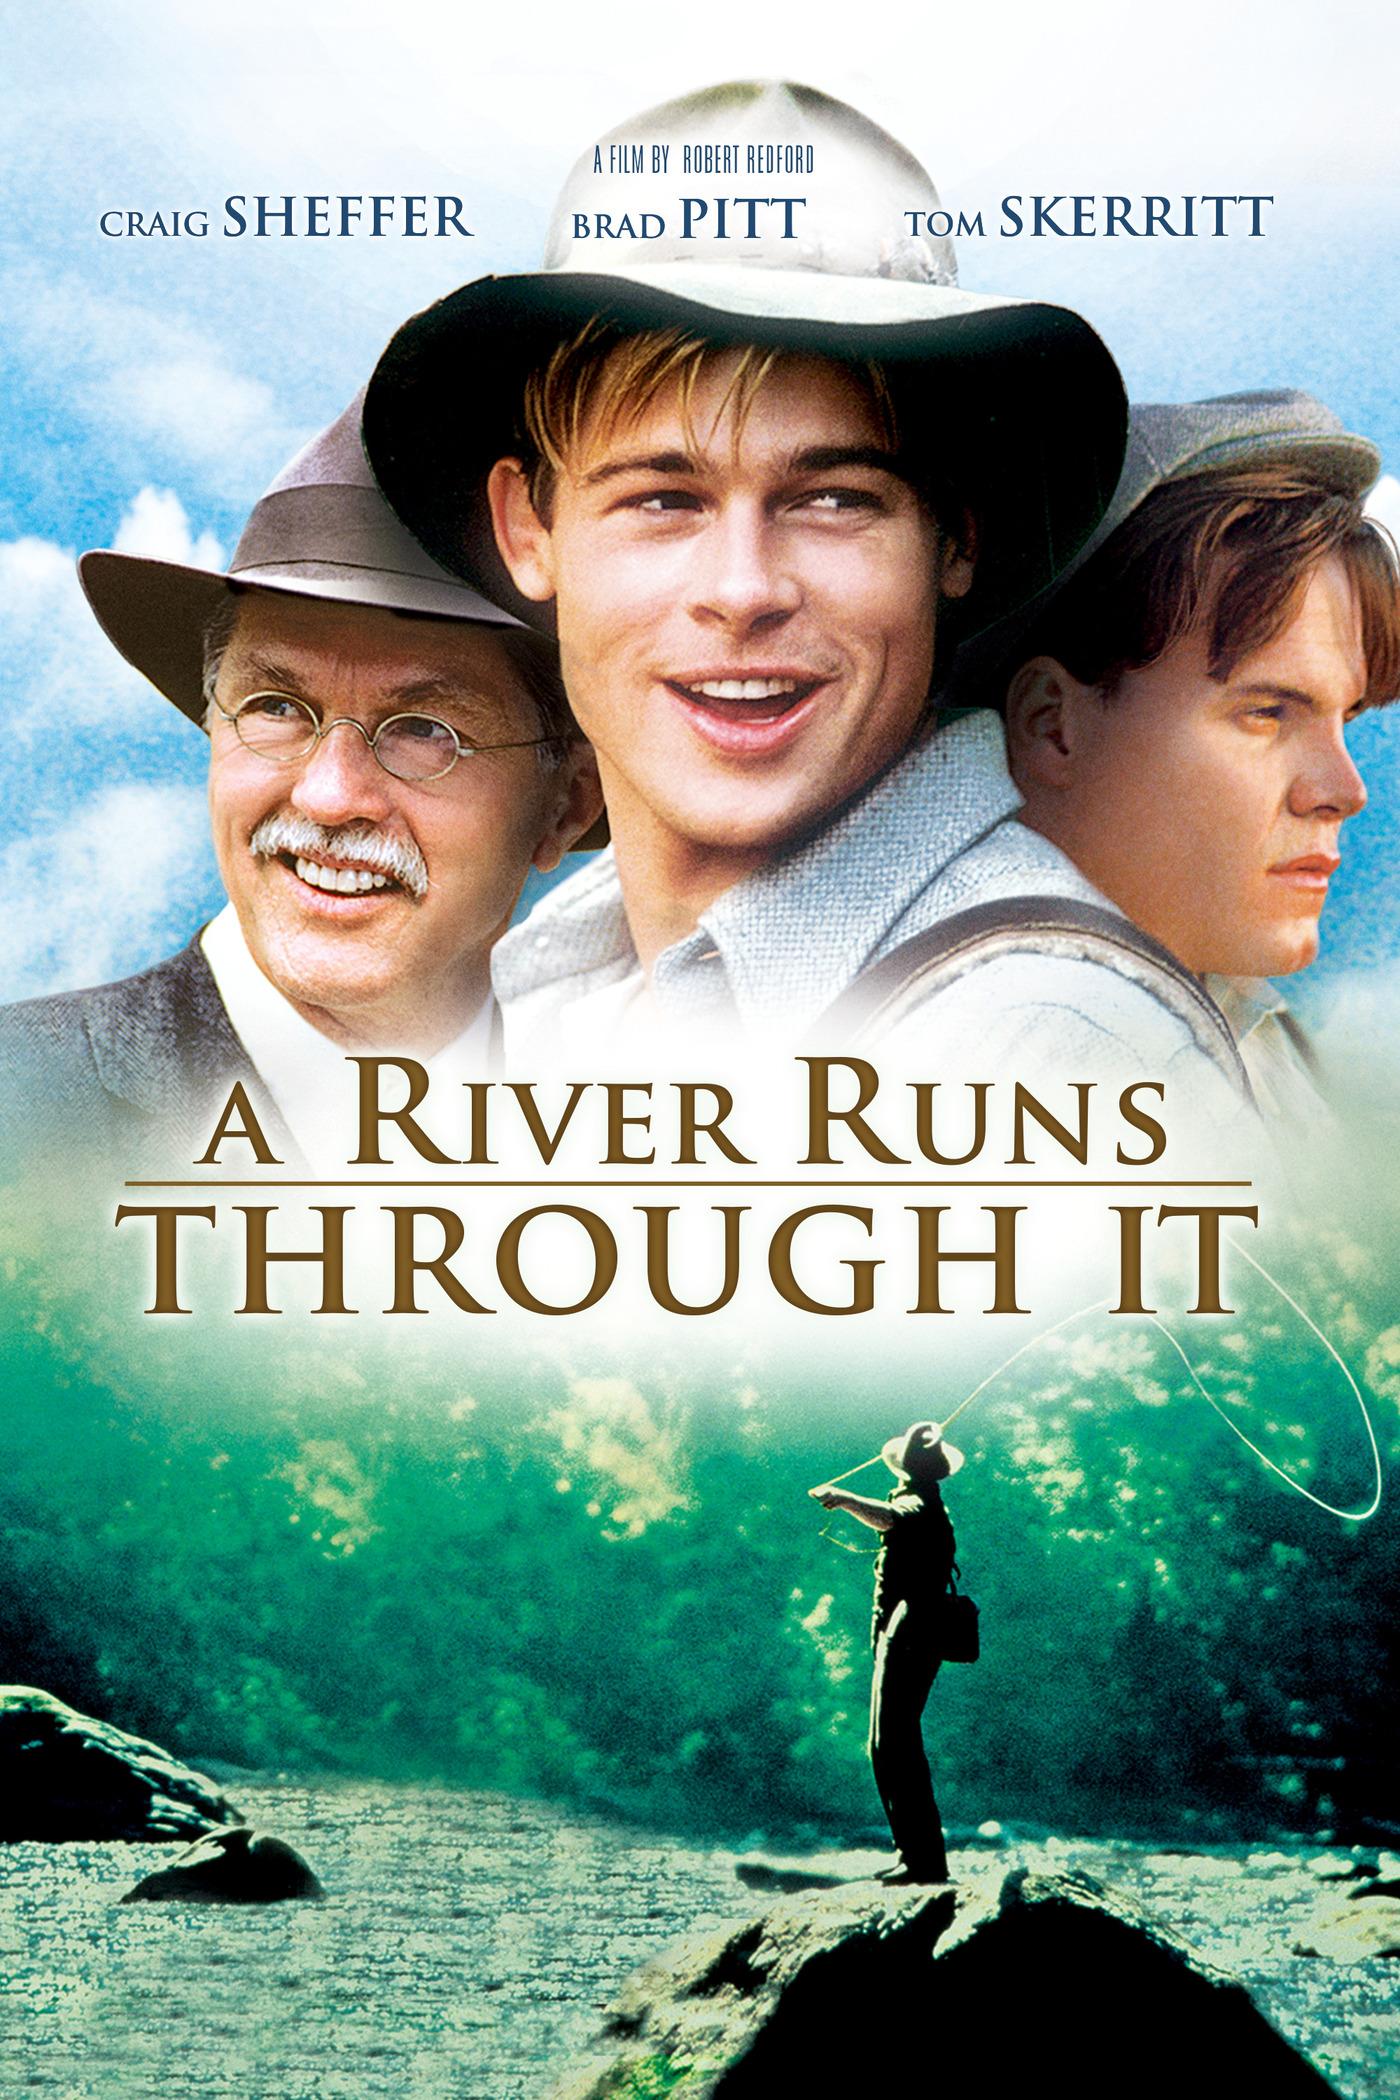 A River Runs Through It | Buy, Rent or Watch on FandangoNOW